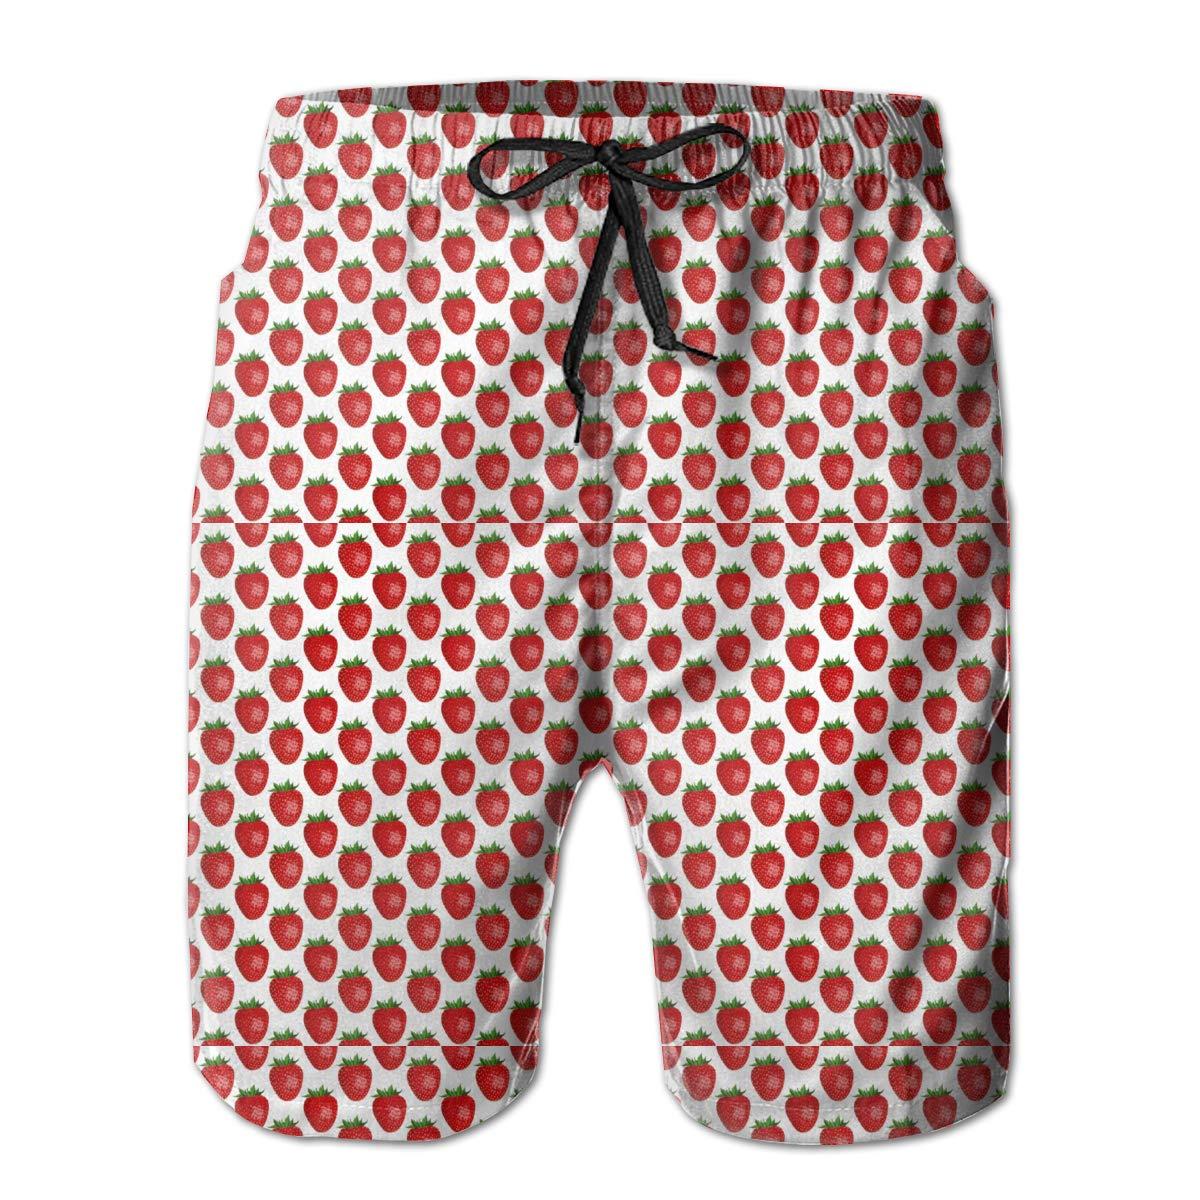 Jngjs Mens Quick Dry Sports Shorts with Drawstring Beach Shorts